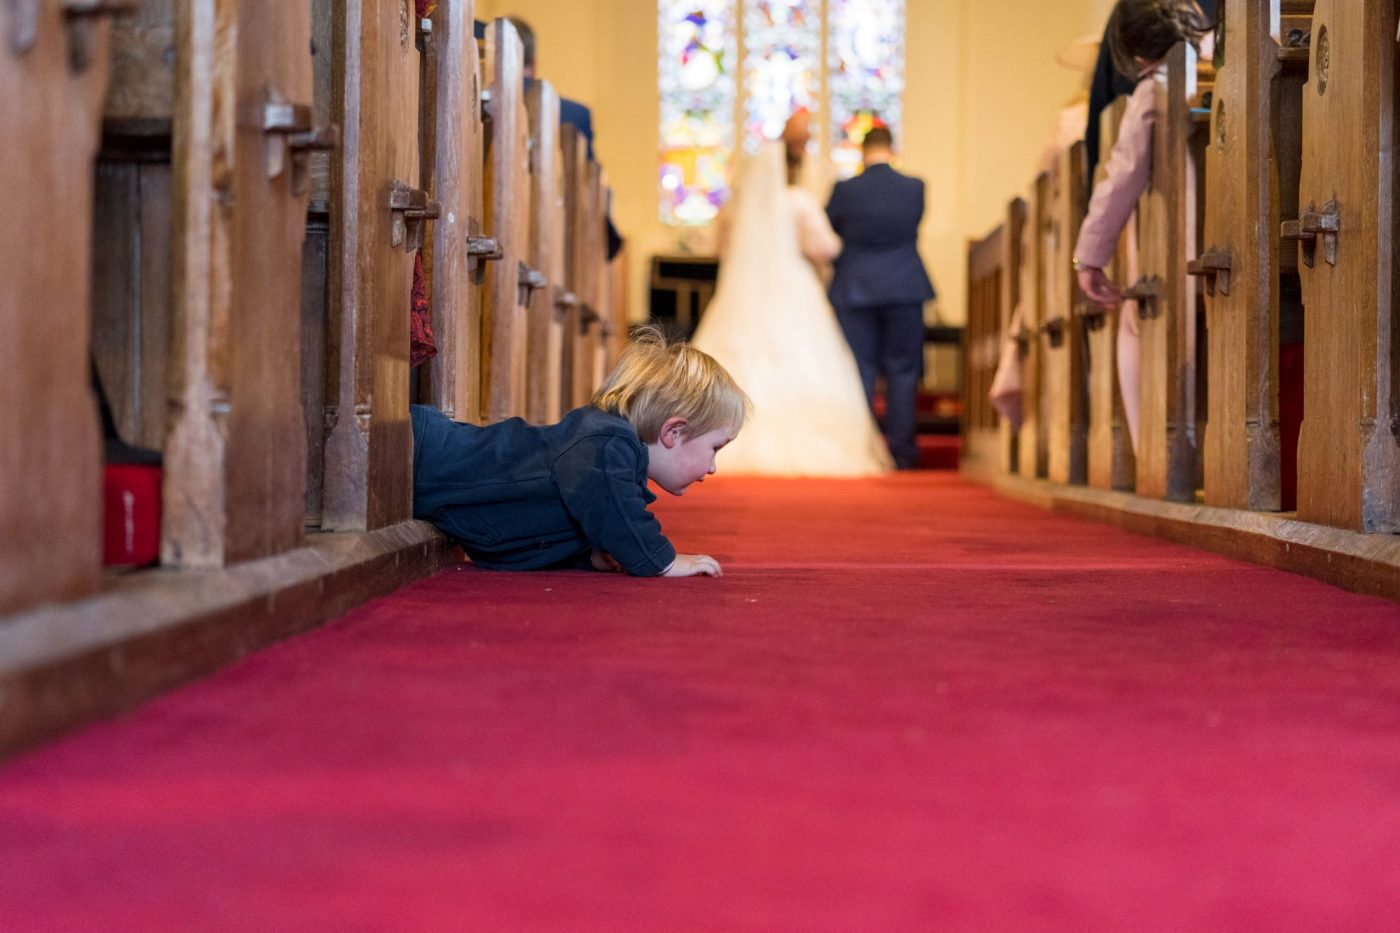 Wedding Photography by S.R.Urwin Wedding Photography